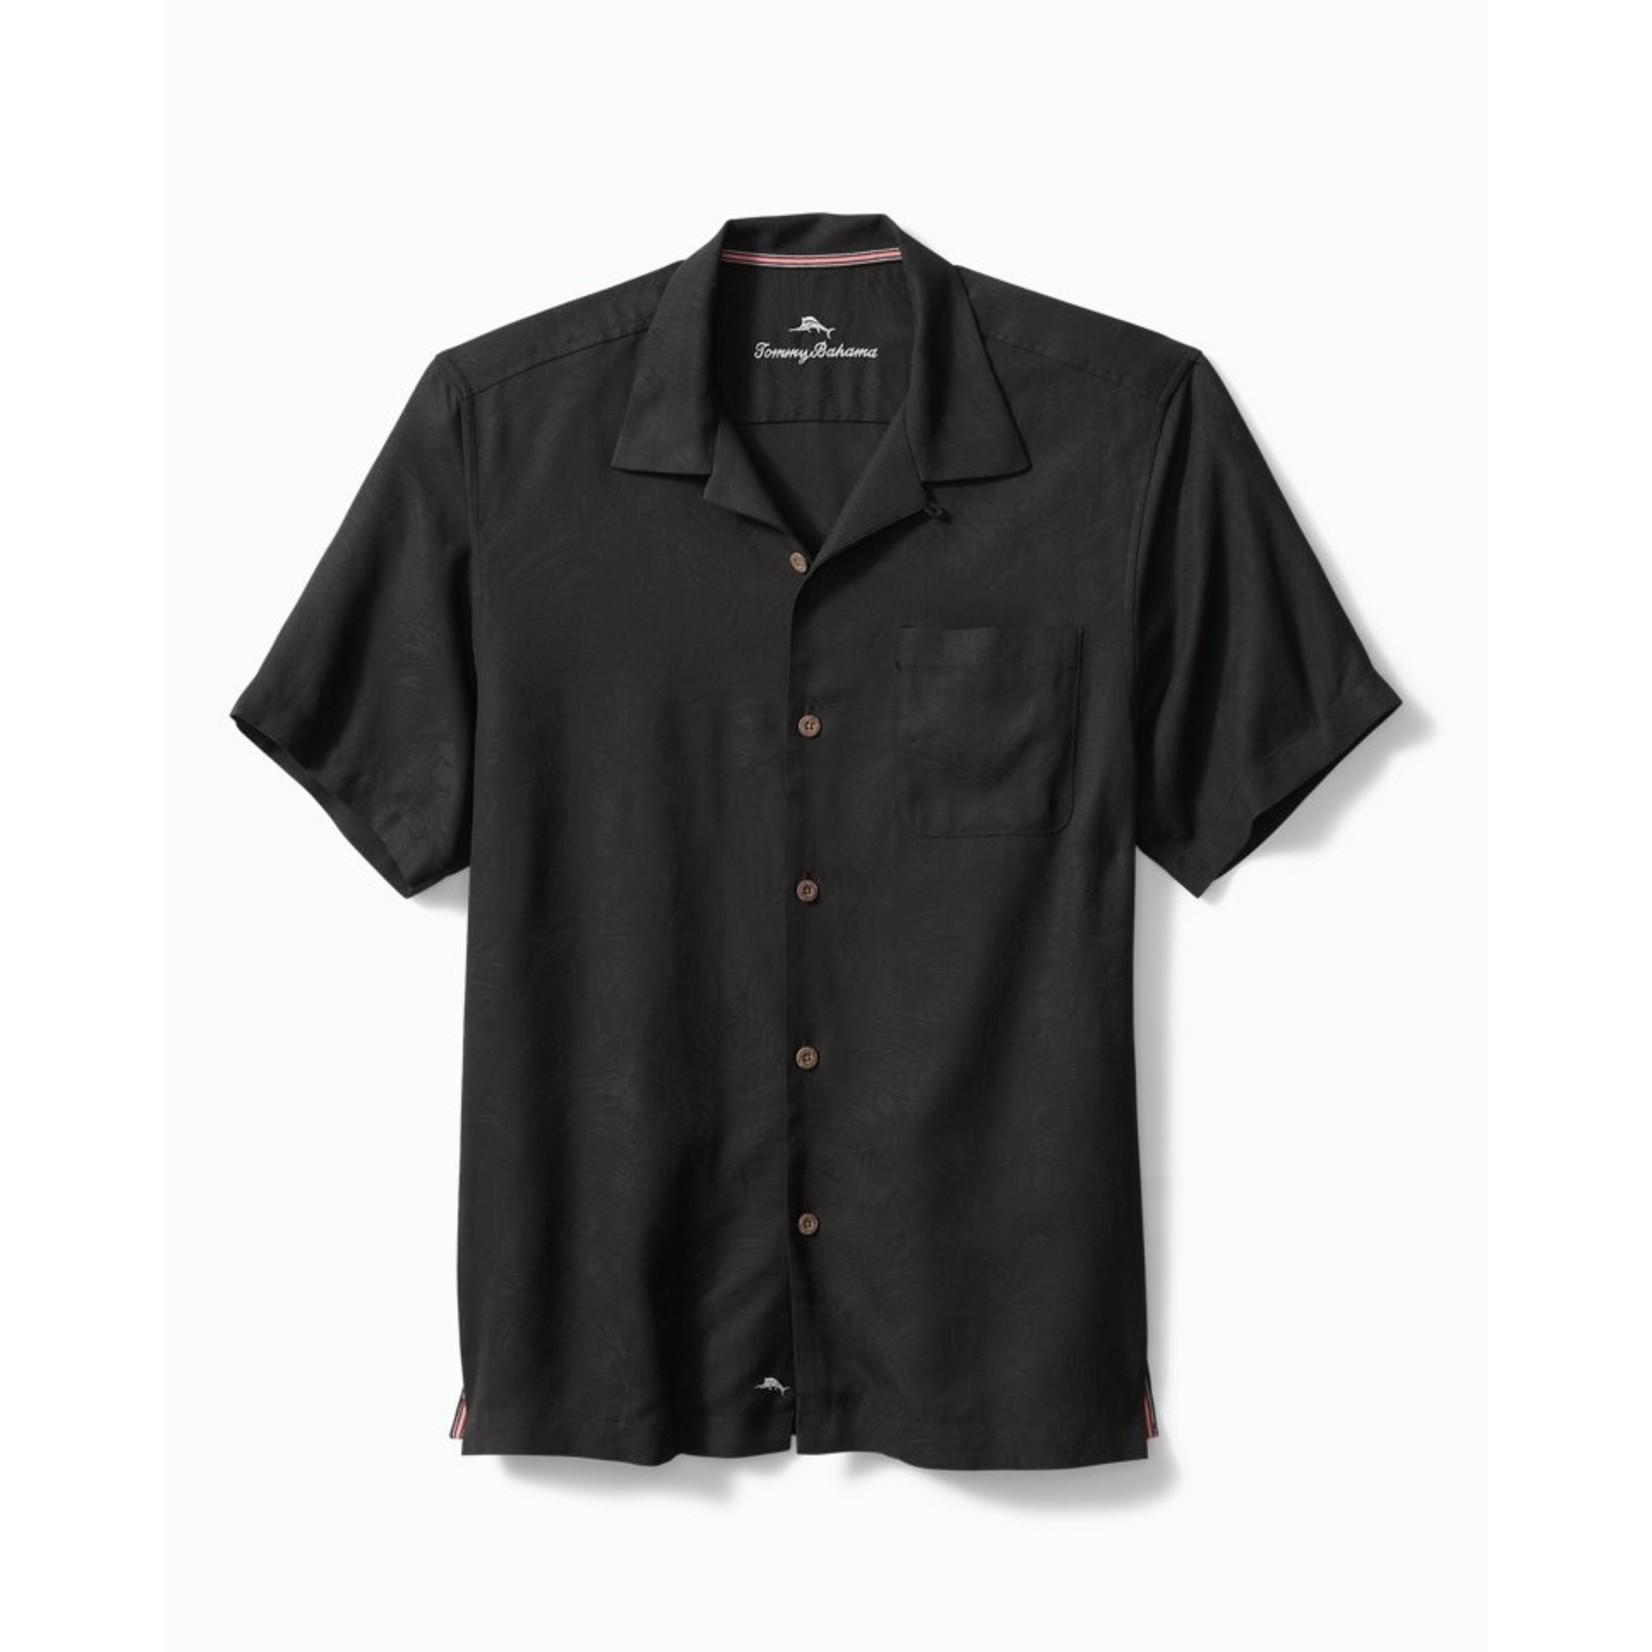 Tommy Bahama Tommy Bahama ST325384 Tropic Isles Short Sleeve Camp Shirt